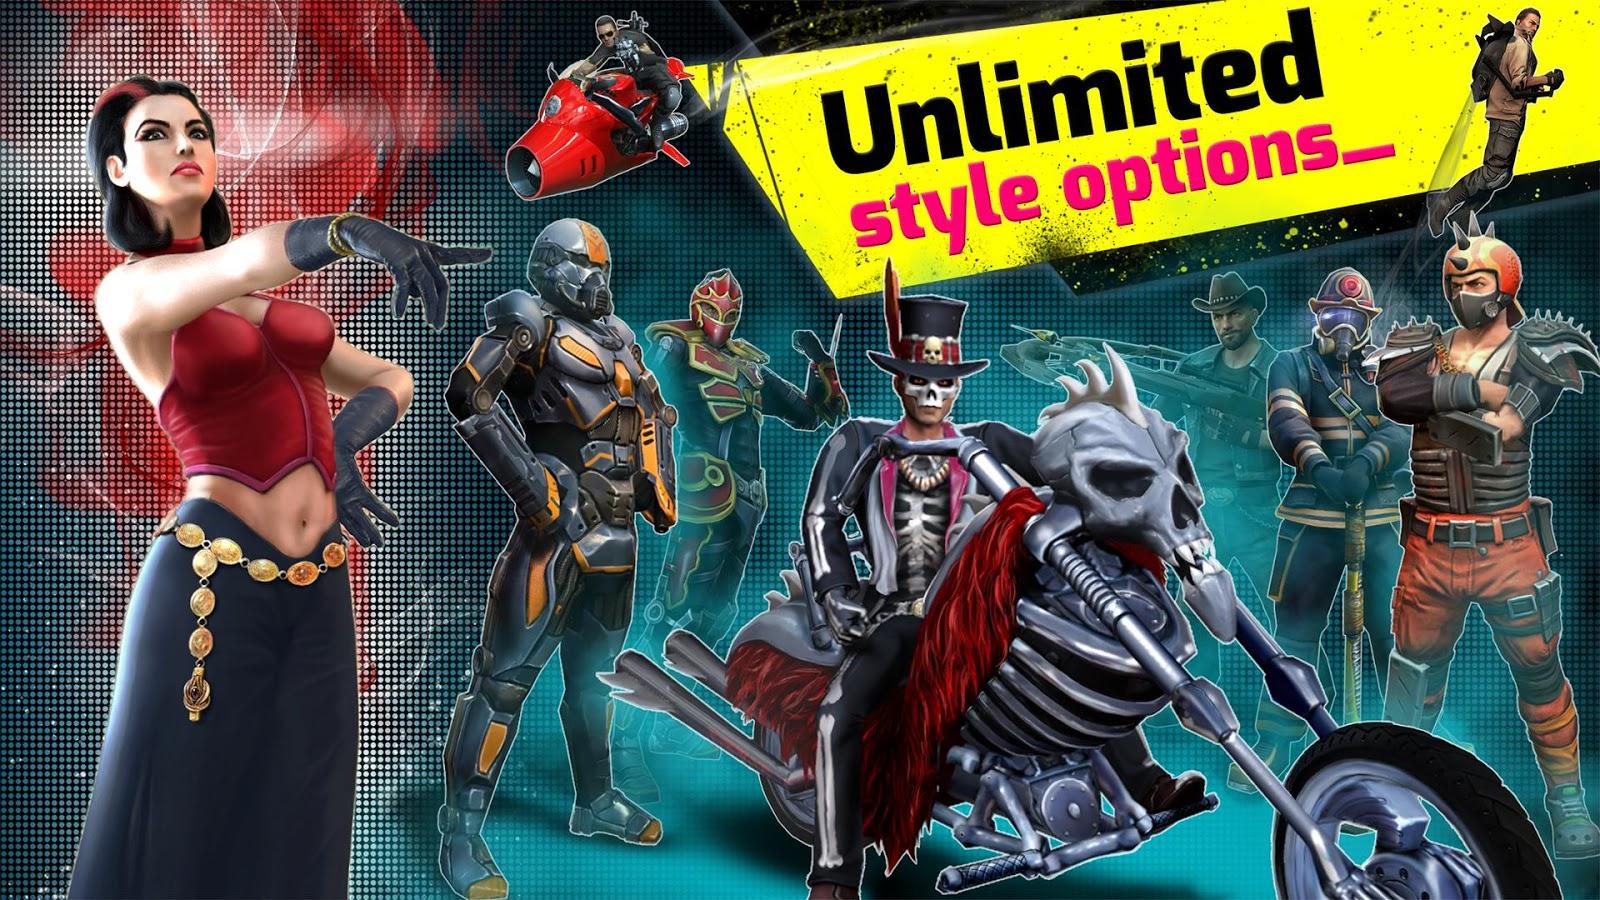 Download Gangstar Vegas Mod Apk Latest: Get Unlimited Diamonds